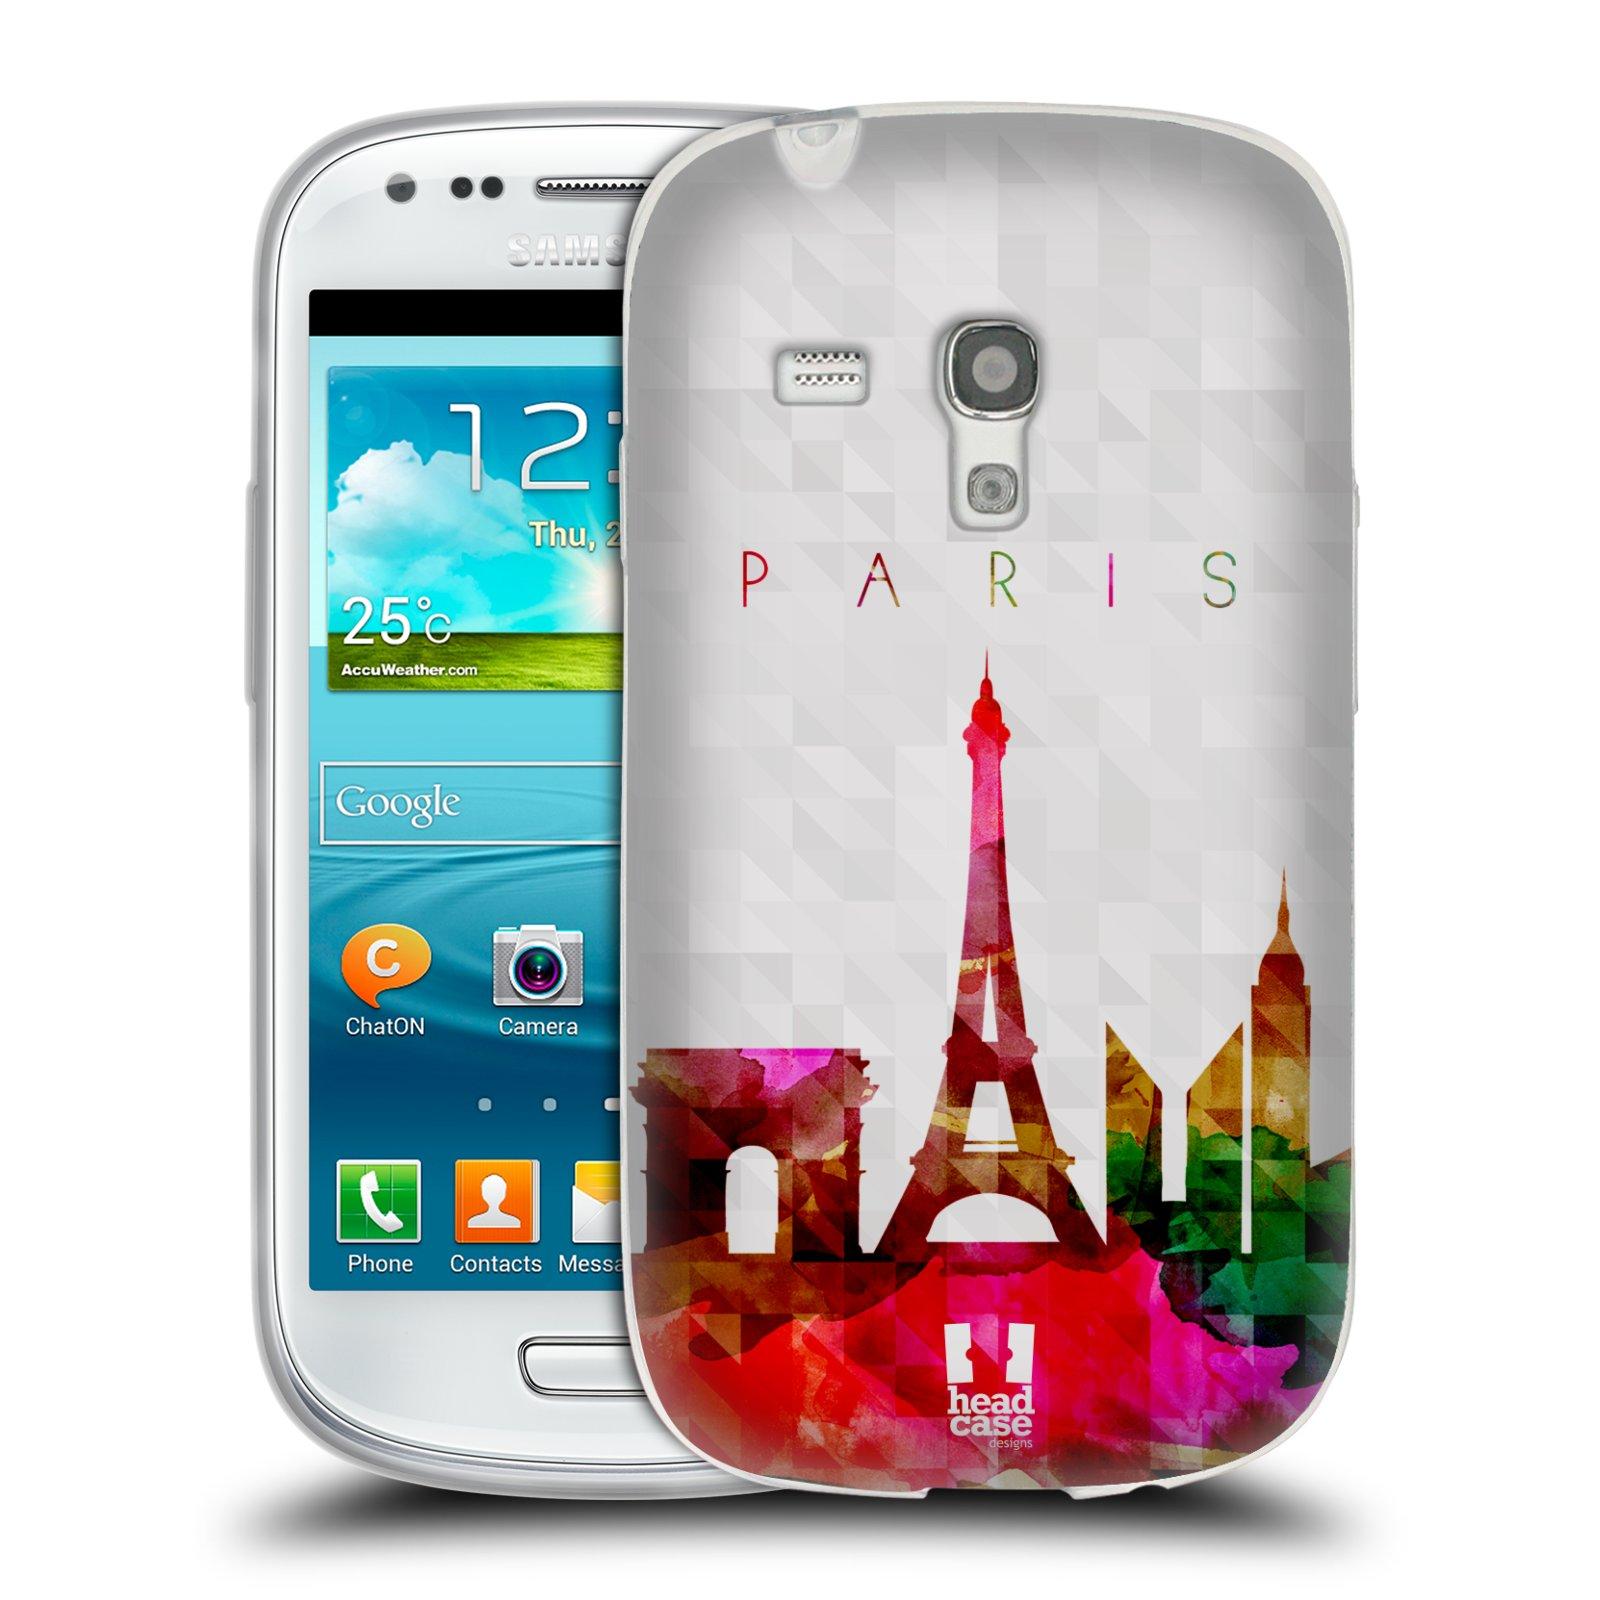 HEAD CASE silikonový obal na mobil Samsung Galaxy S3 MINI i8190 vzor Vodní barva města silueta PAŘÍŽ FRANICE EIFFELOVA VĚŽ